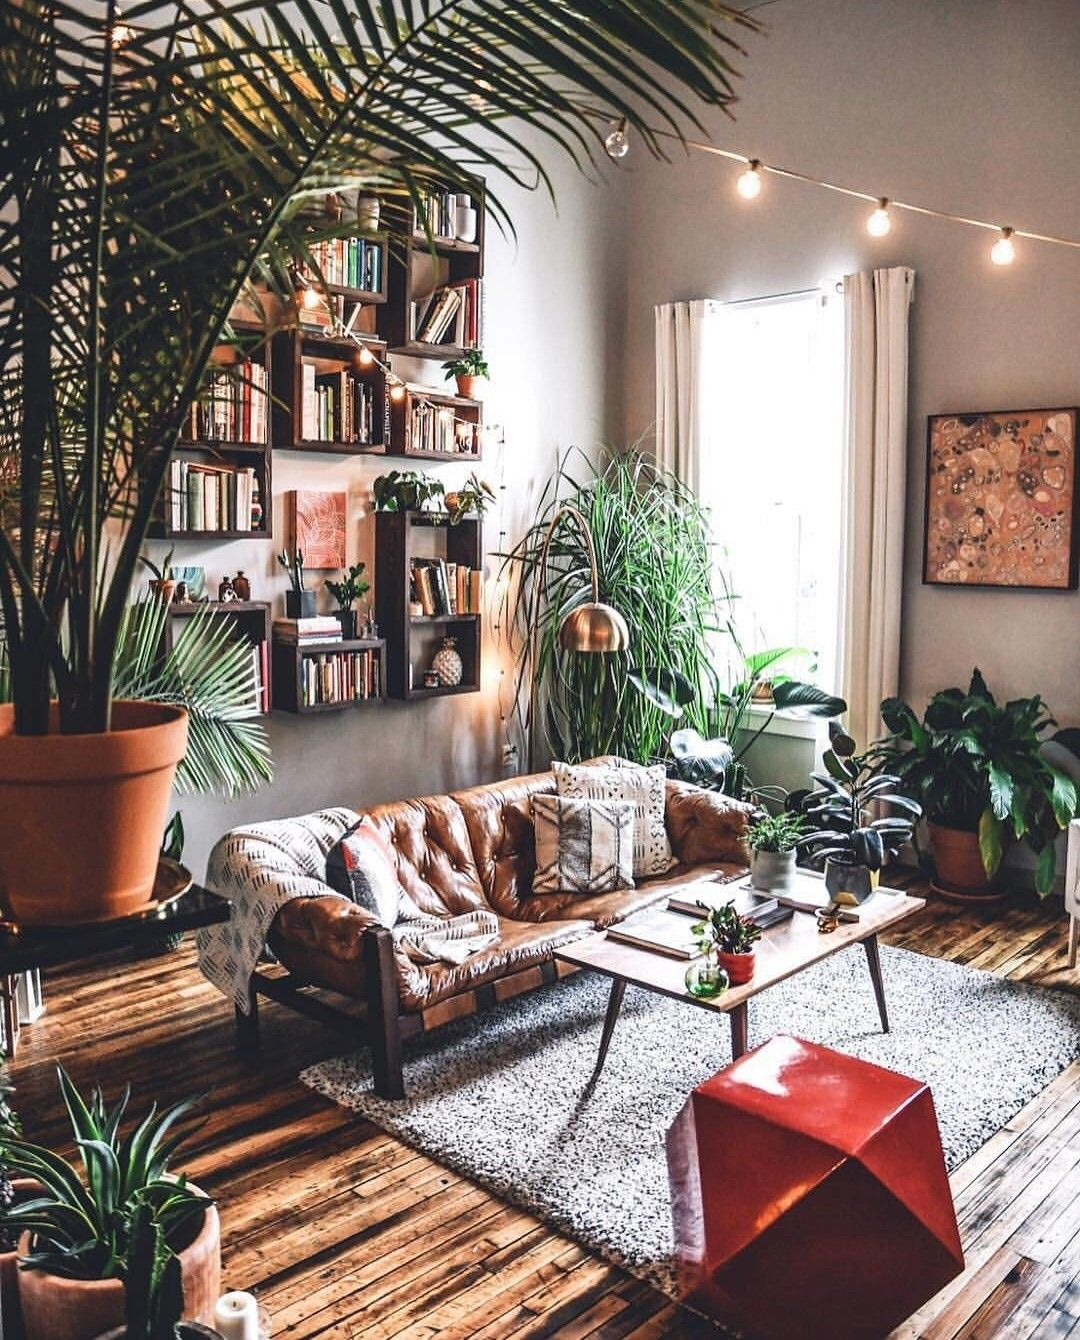 pin by bohoasis on boho decor interior design interior design living room on boho chic decor living room bohemian kitchen id=30843